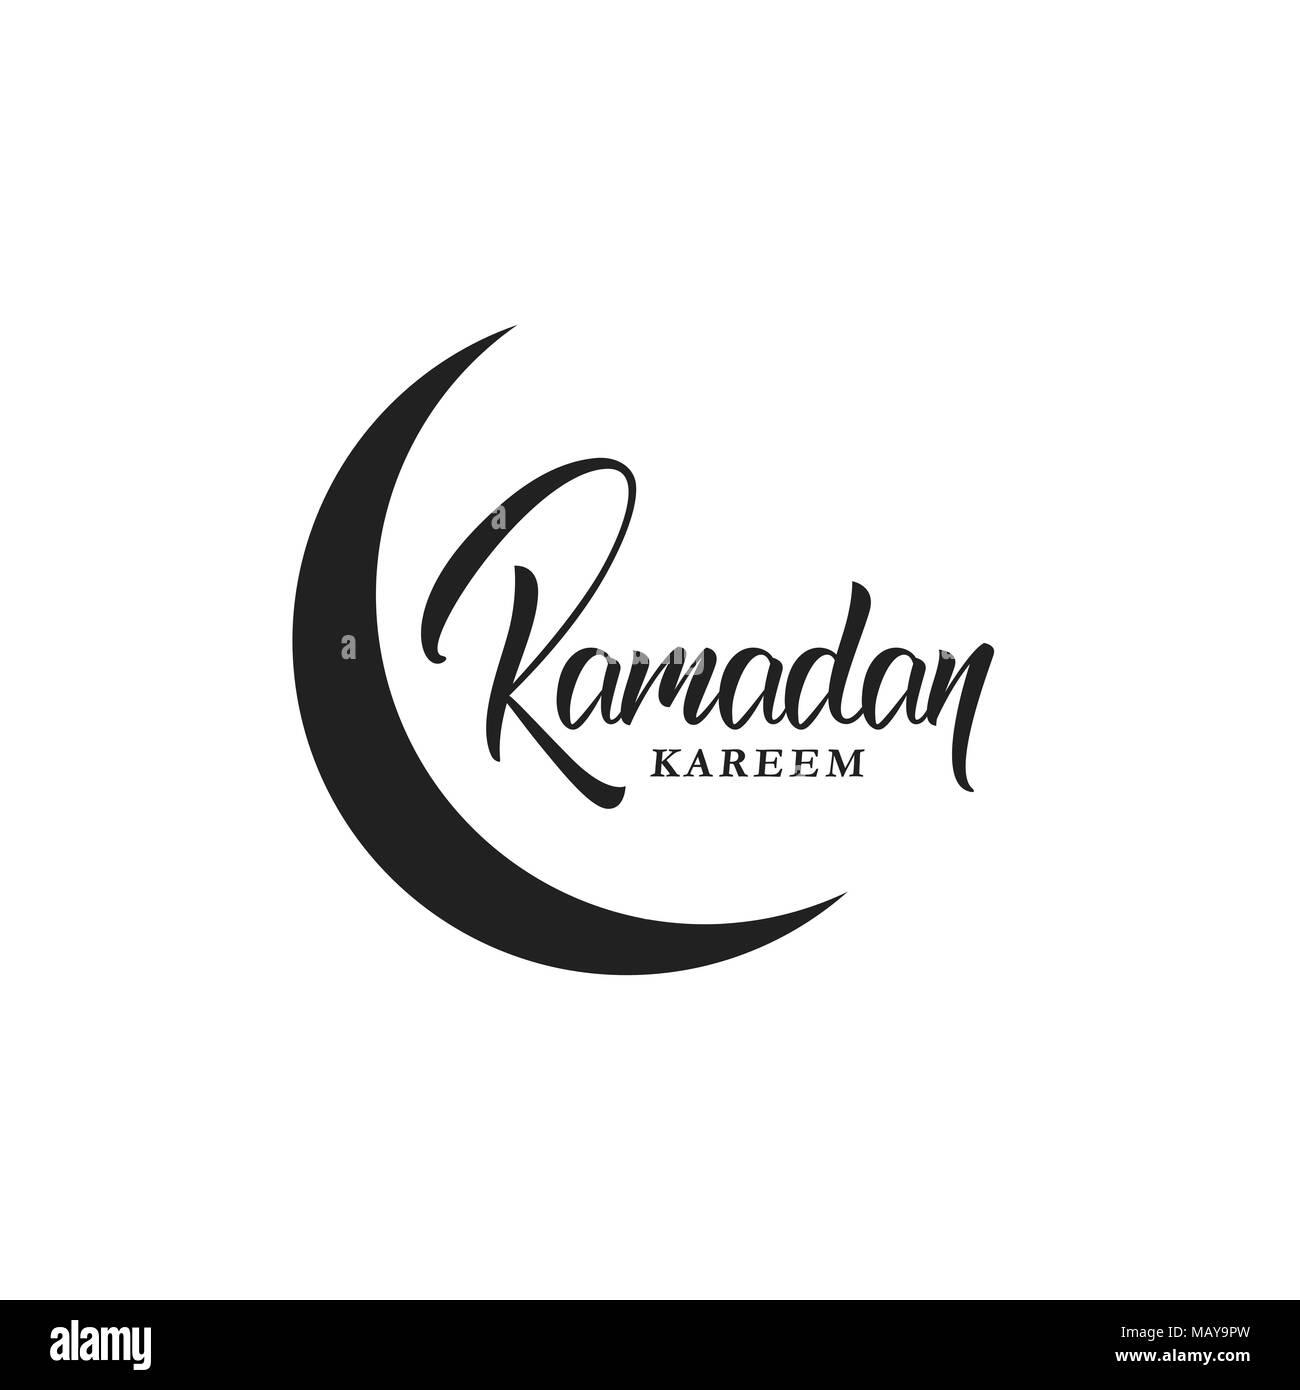 Ramadan greeting card black and white stock photos images page 2 ramadan muslim holiday lettering logo design ramadan holiday calligraphy design stock image kristyandbryce Image collections